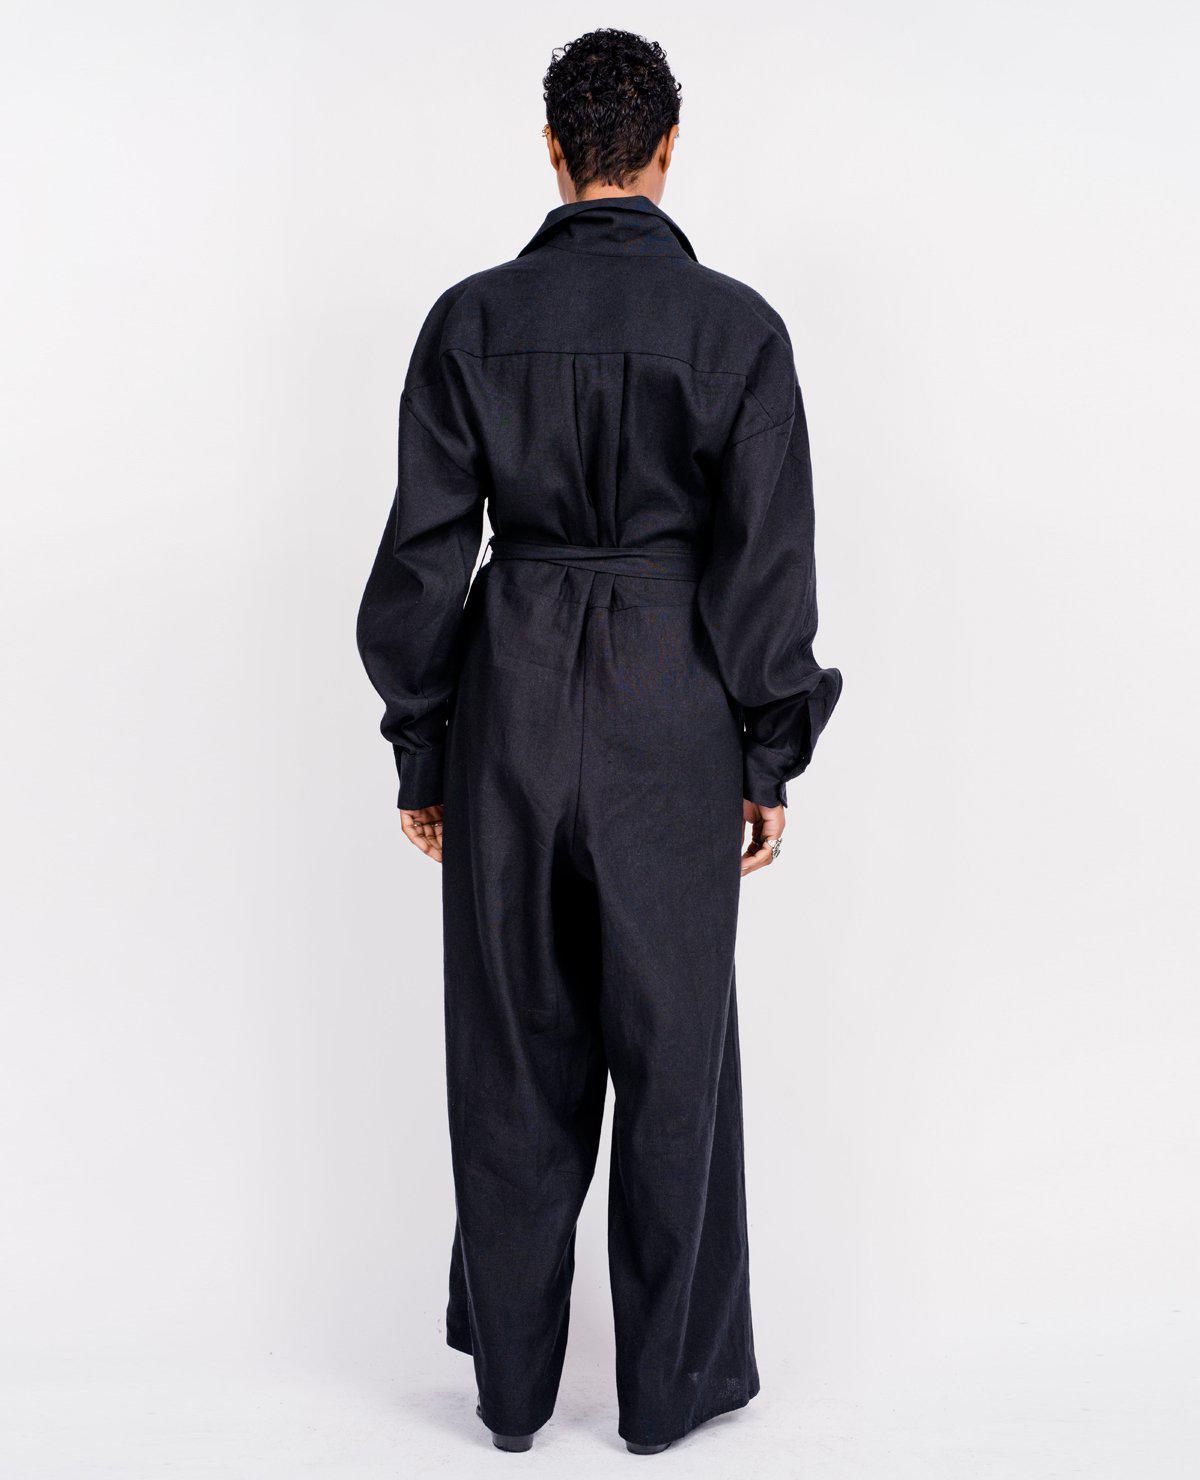 e13a7ce67c12 Lyst - Baserange Aorta Jumpsuit   Black in Black